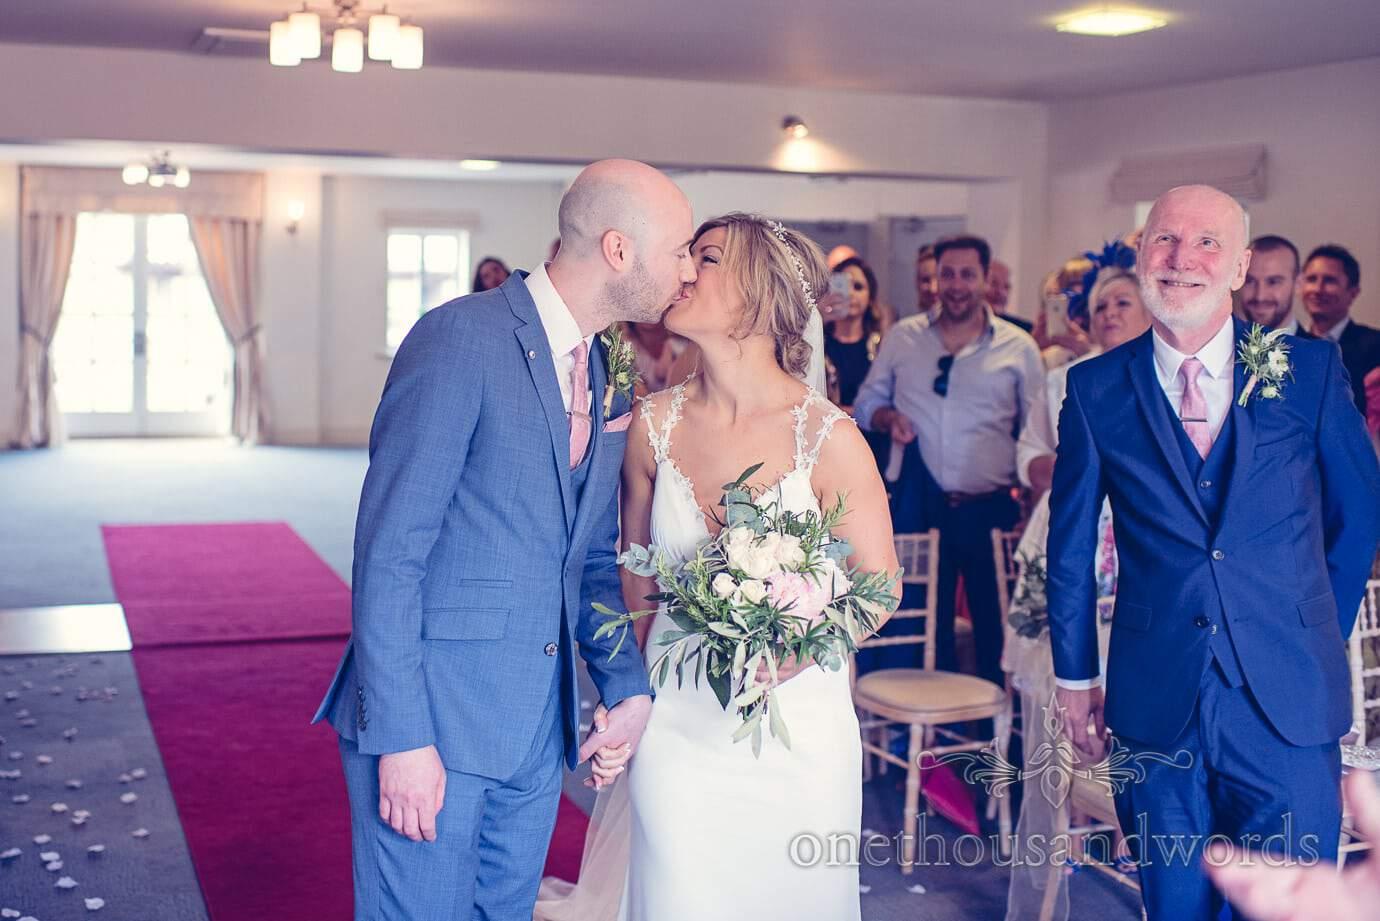 Bride and groom kiss during ceremony at Italian Villa Wedding Photographs